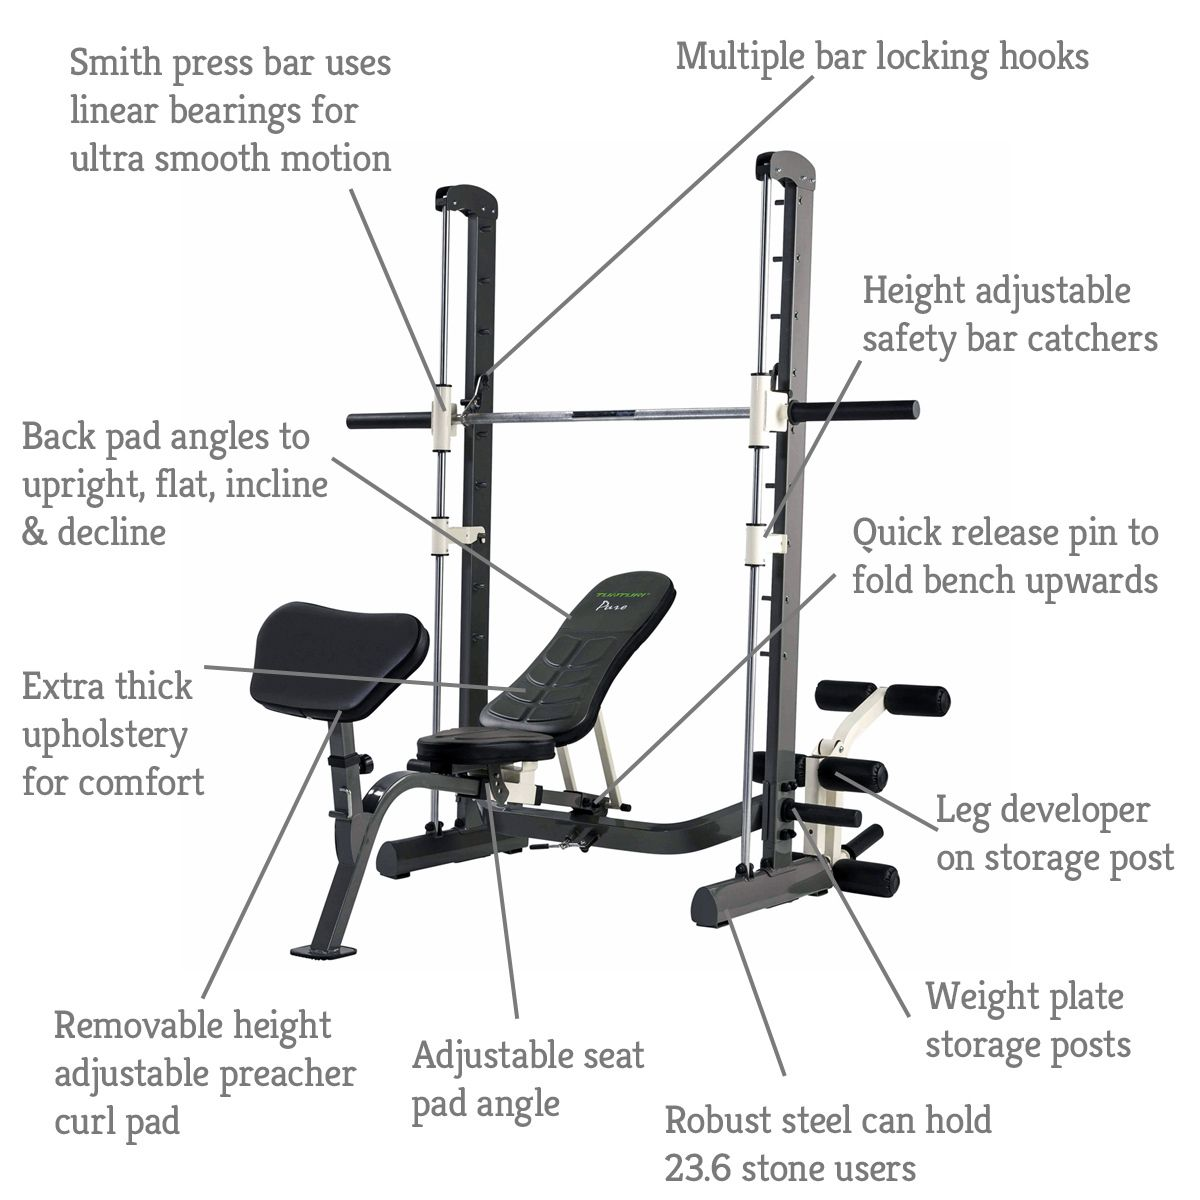 Tunturi Pure Compact Smith Machine Weight Bench With Folding Design At Purefitness Amp Sports Weight Benches Smith Machine Best Home Workout Equipment